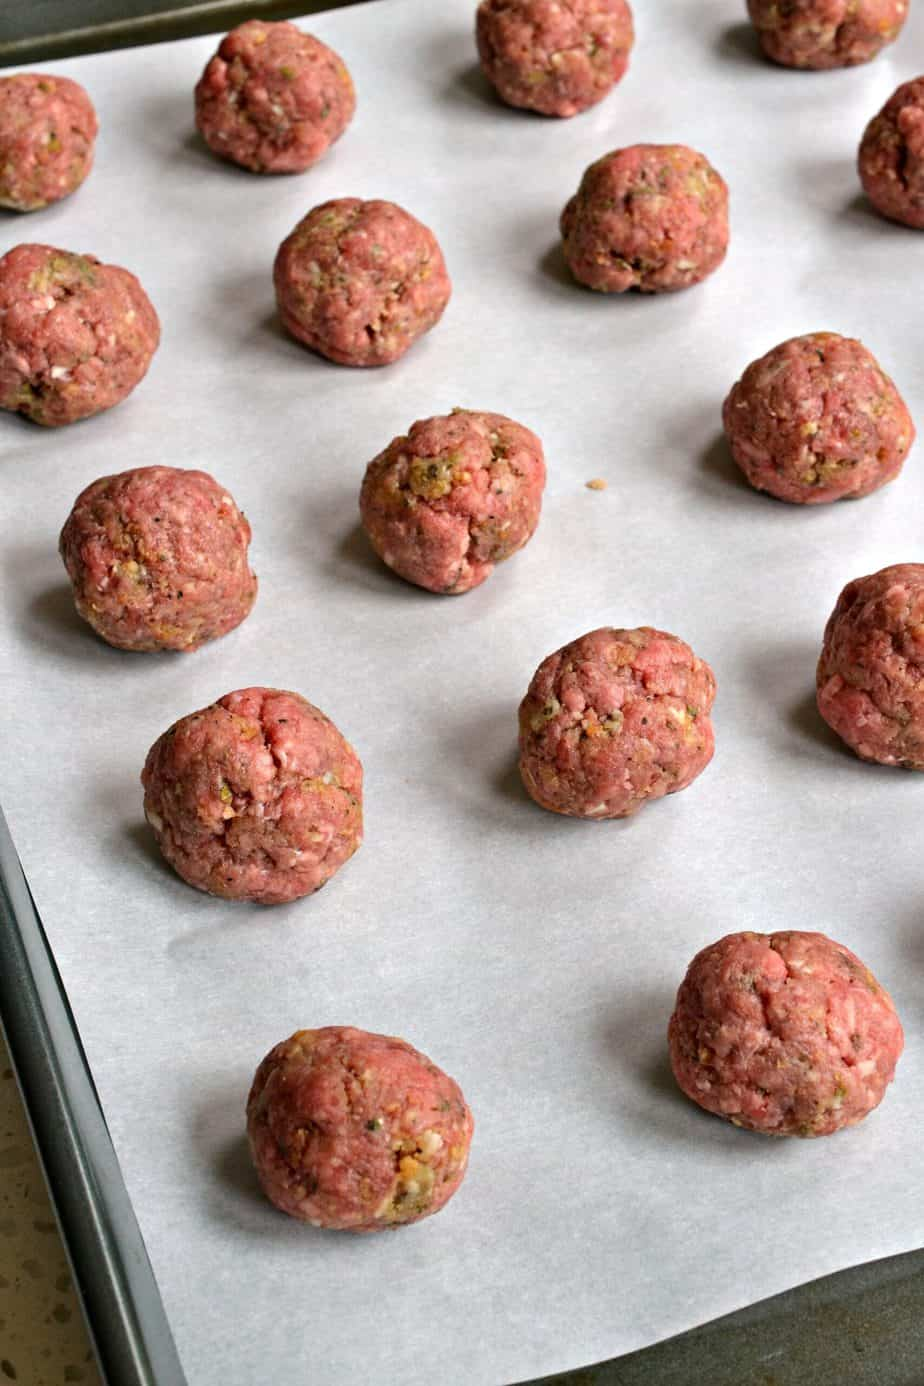 How to make meatball subs